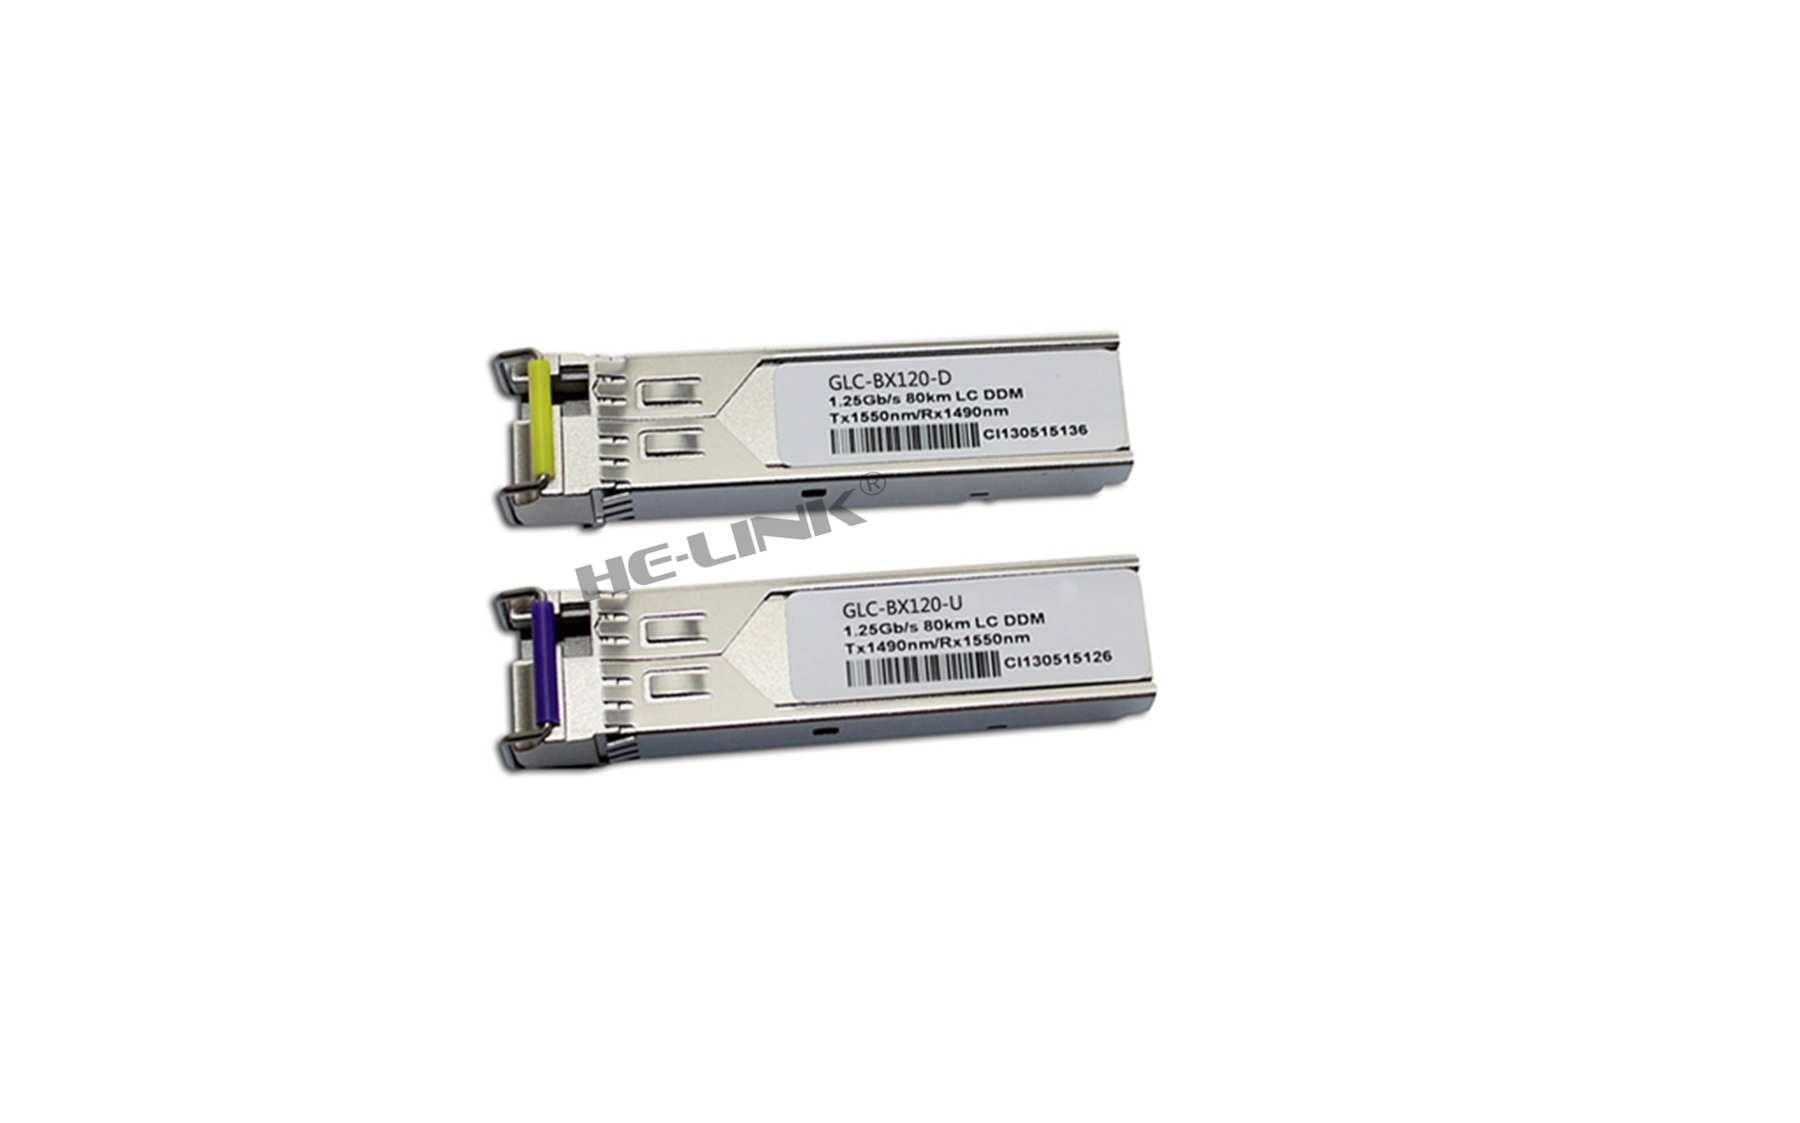 LODFIBER GLC-BX120-U/GLC-BX120-D CISCO Compatible 1.25G 1490/1550nm BiDi 120km Transceiver  - buy with discount